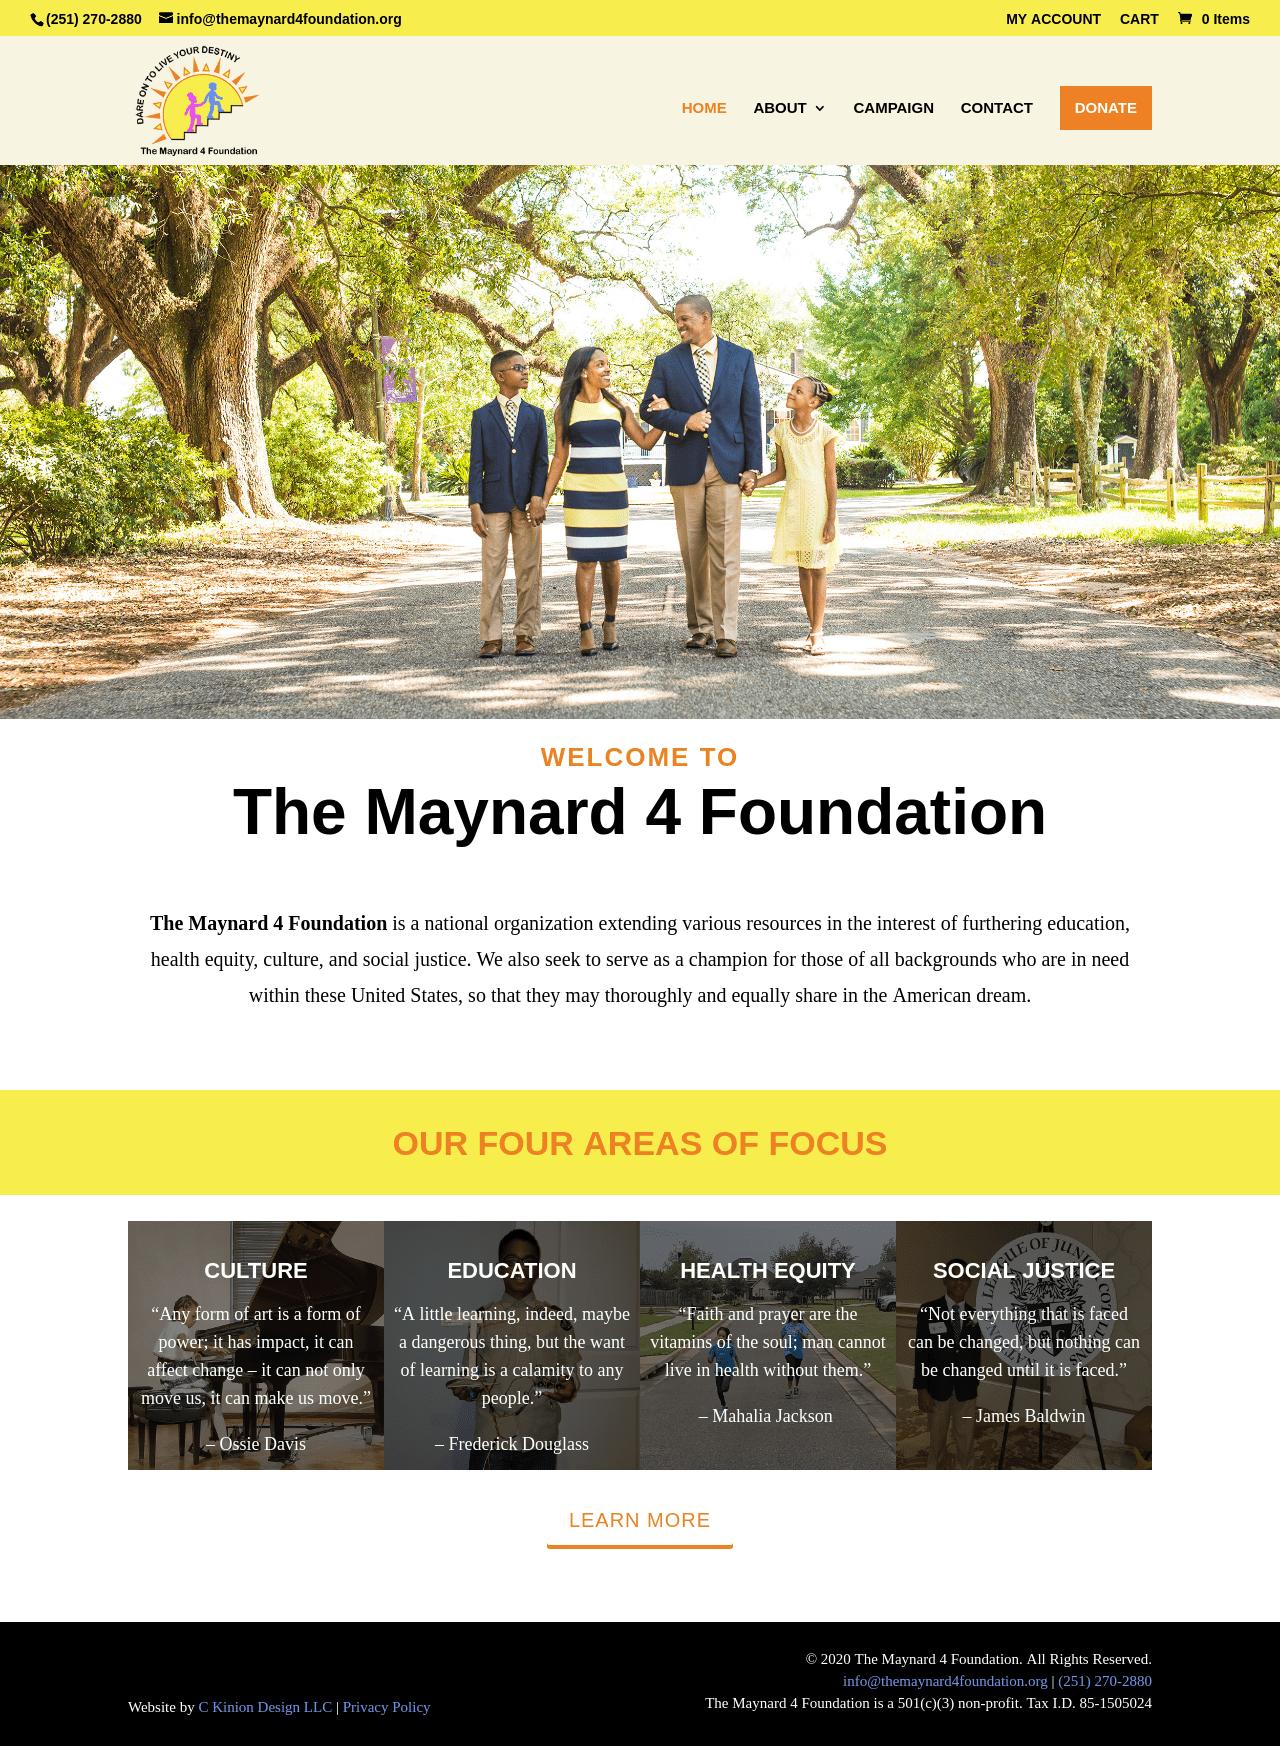 Birmingham-Web-Design-Agency-C-Kinion-Design- The-Maynard-4-Foundation